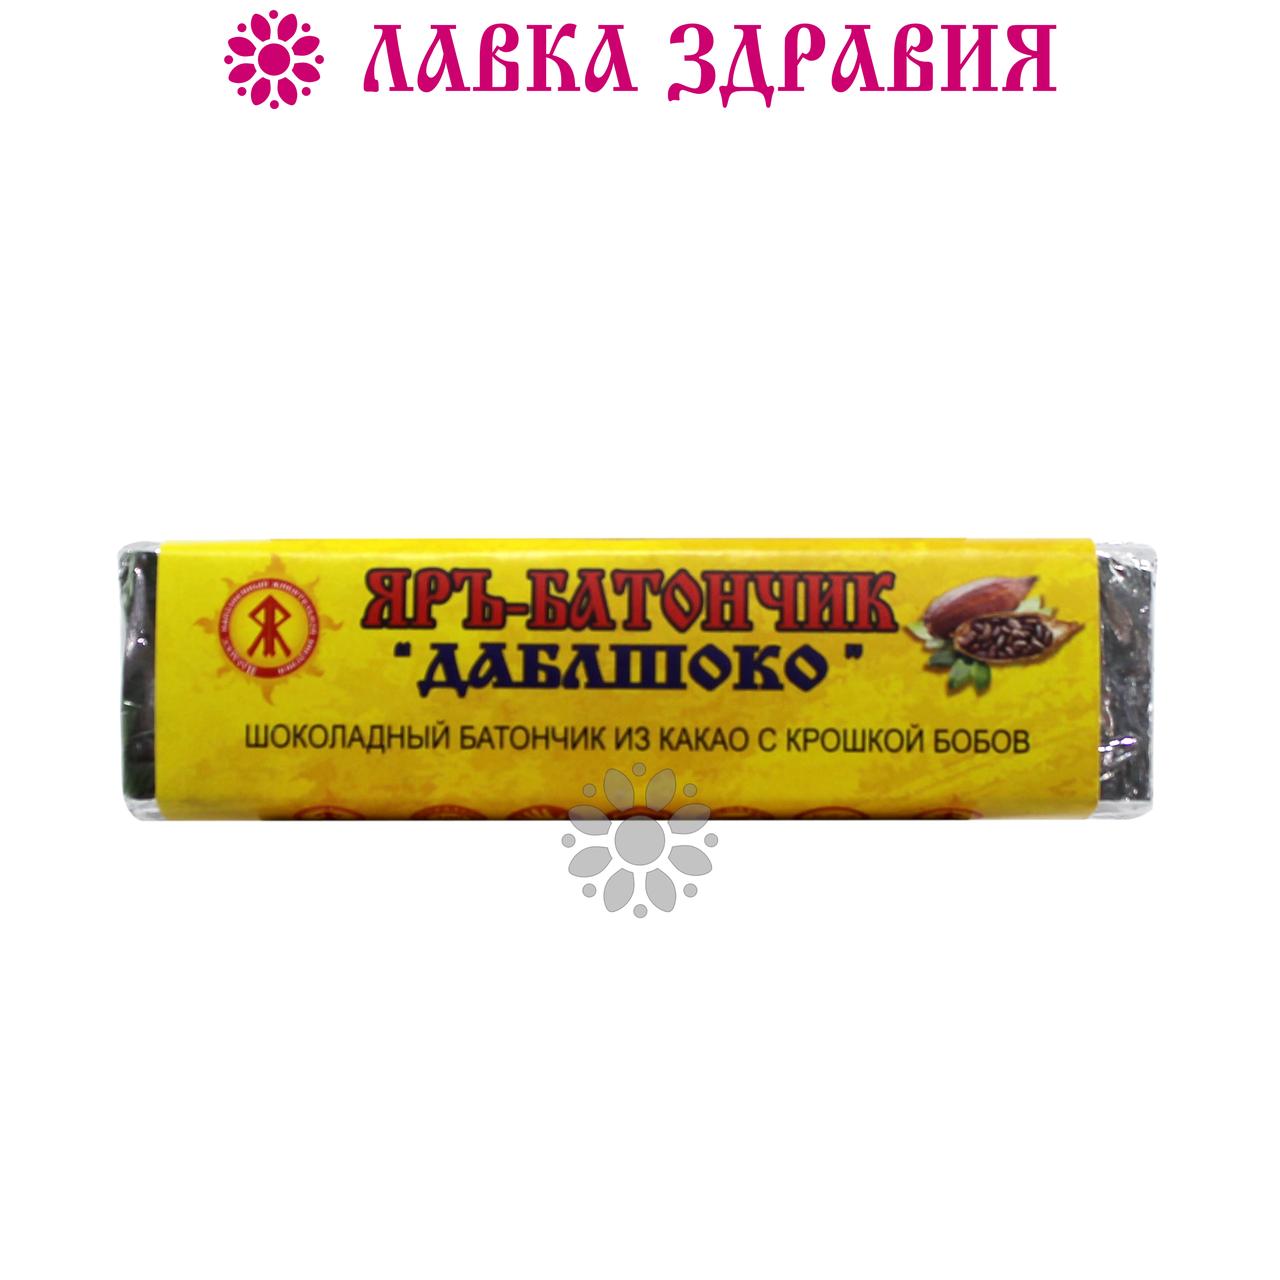 "Яръ-батончик из какао ""Даблшоко"", 60 г"